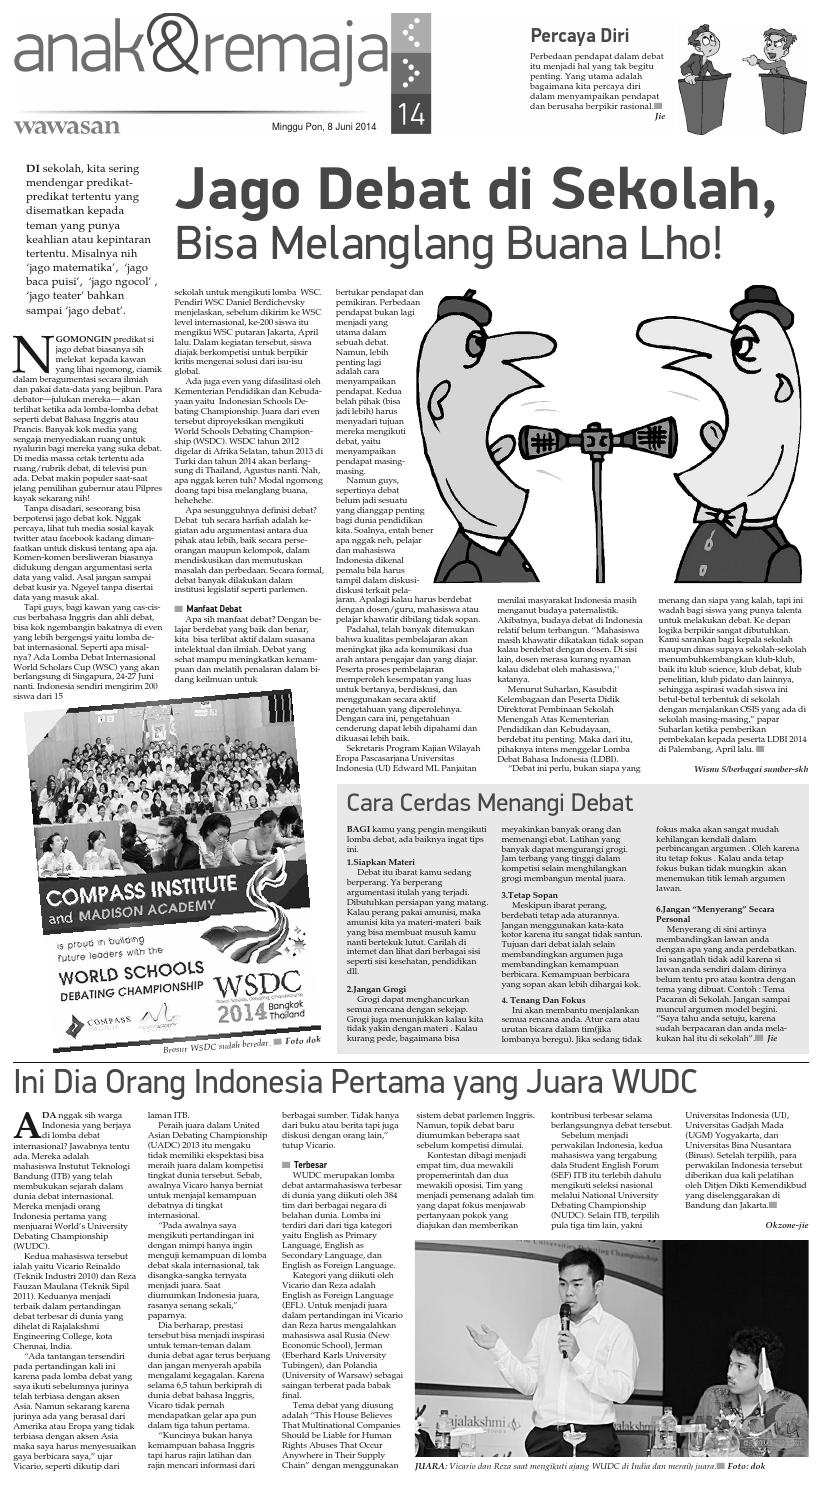 Wawasan 08 Juni 2014 By Koran Pagi Wawasan Issuu